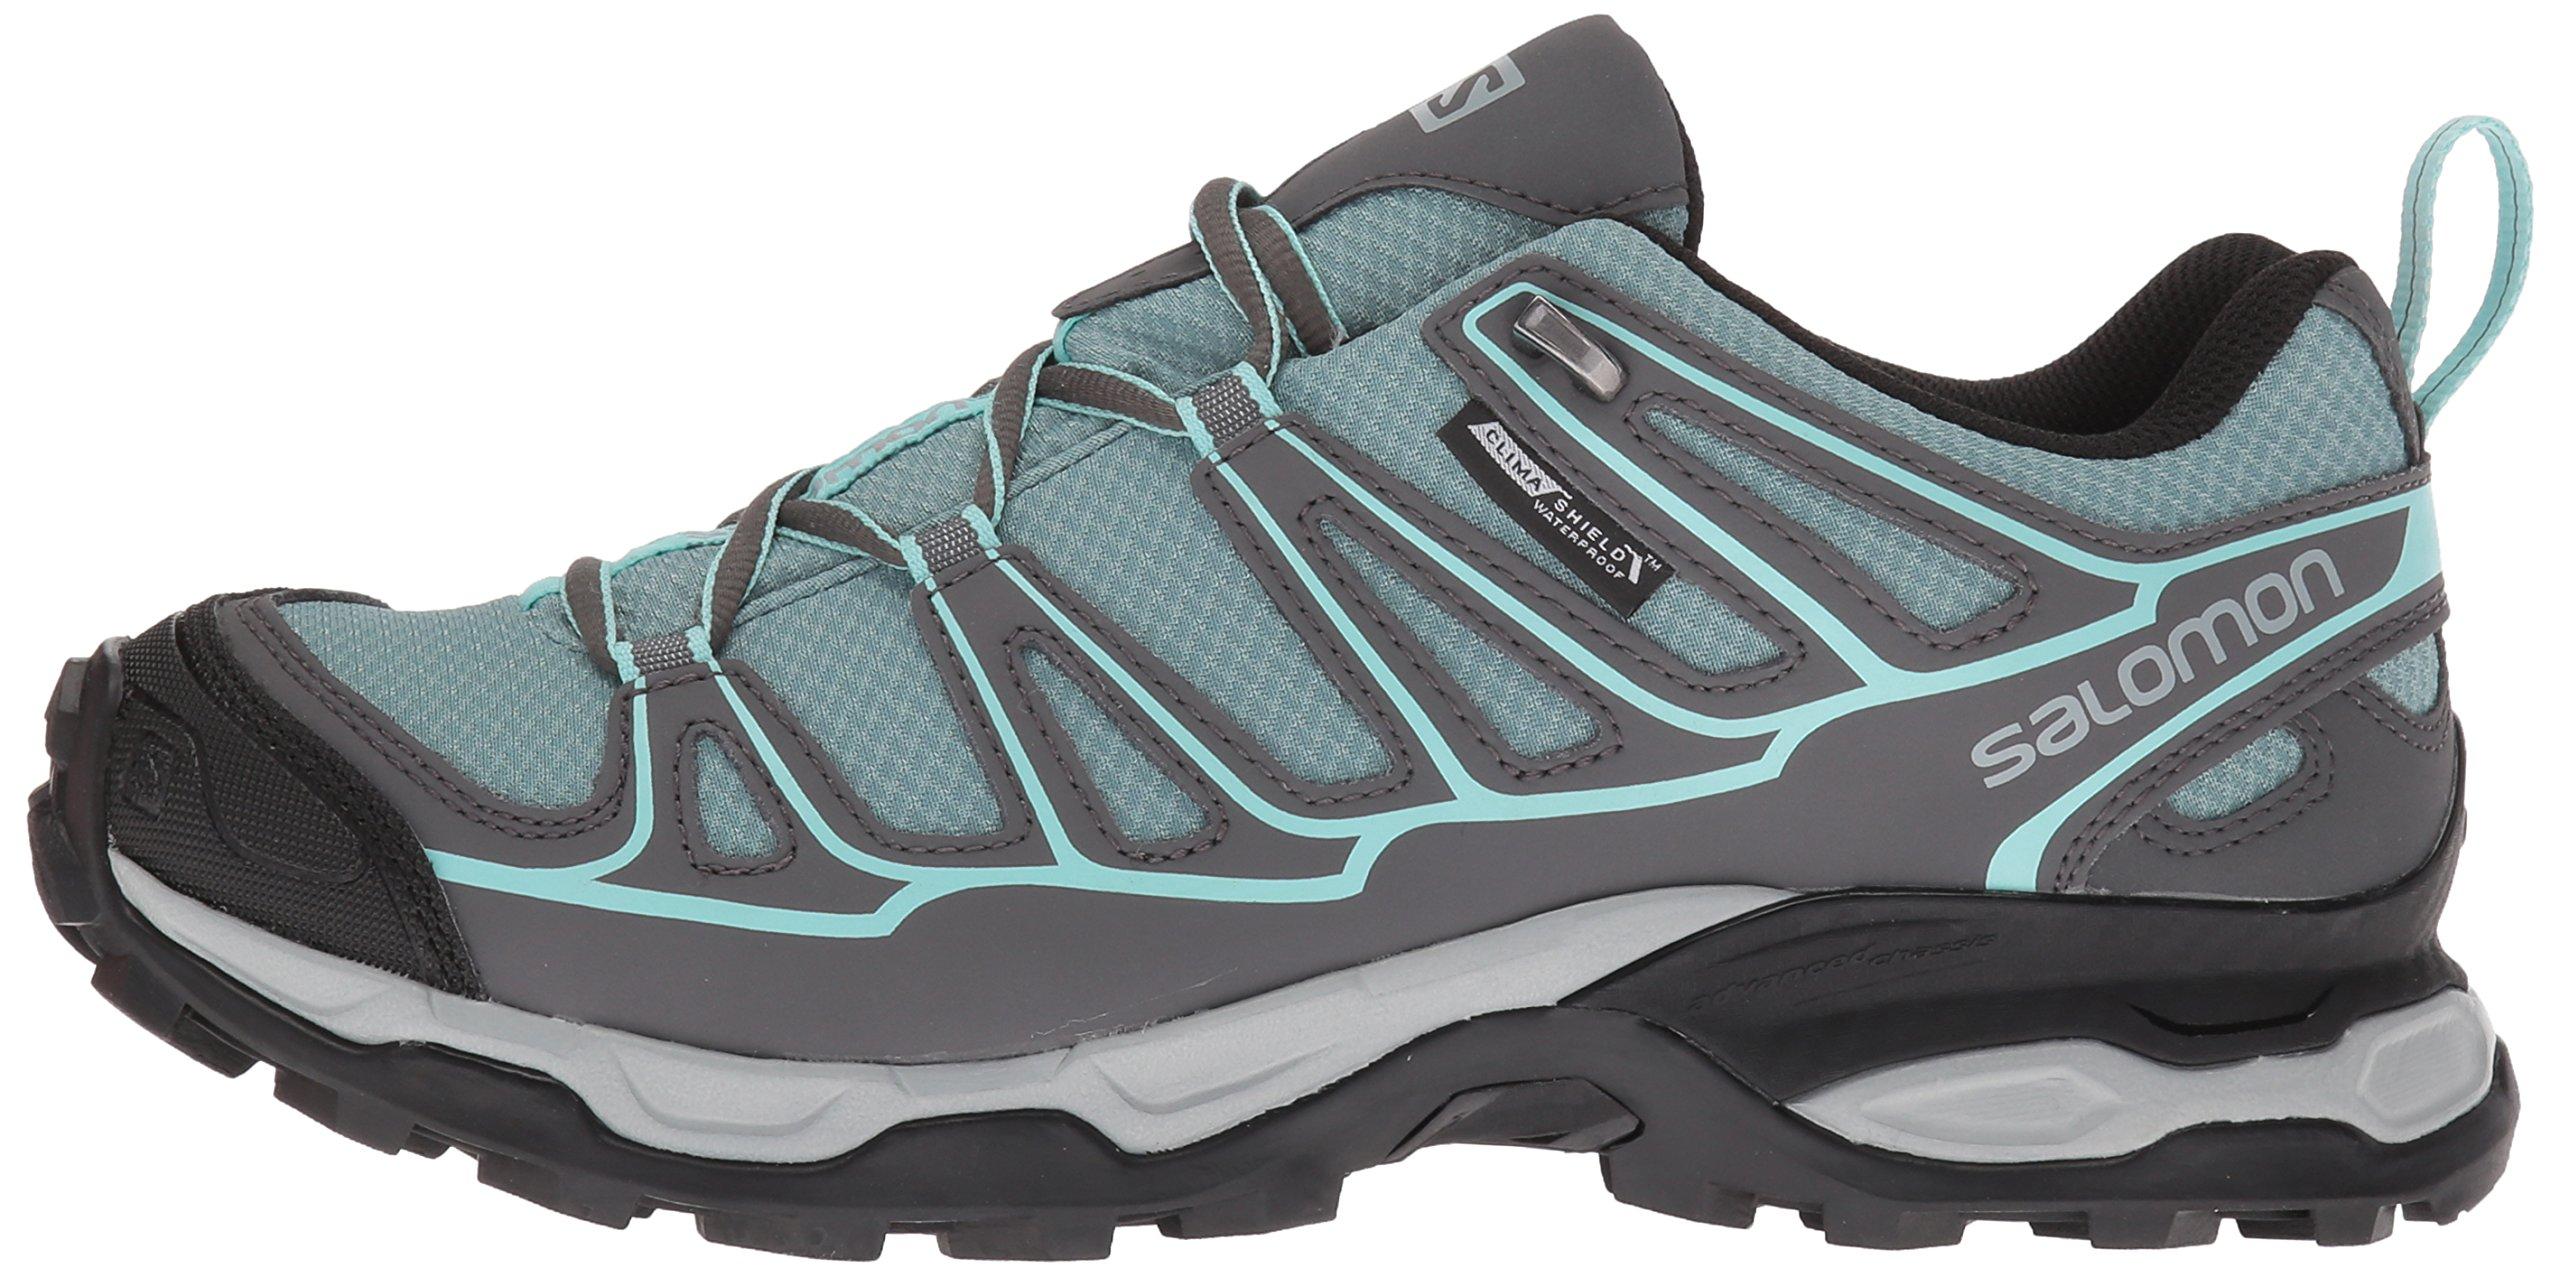 81hJqBm5P%2BL - SALOMON Women's Hiking Shoe